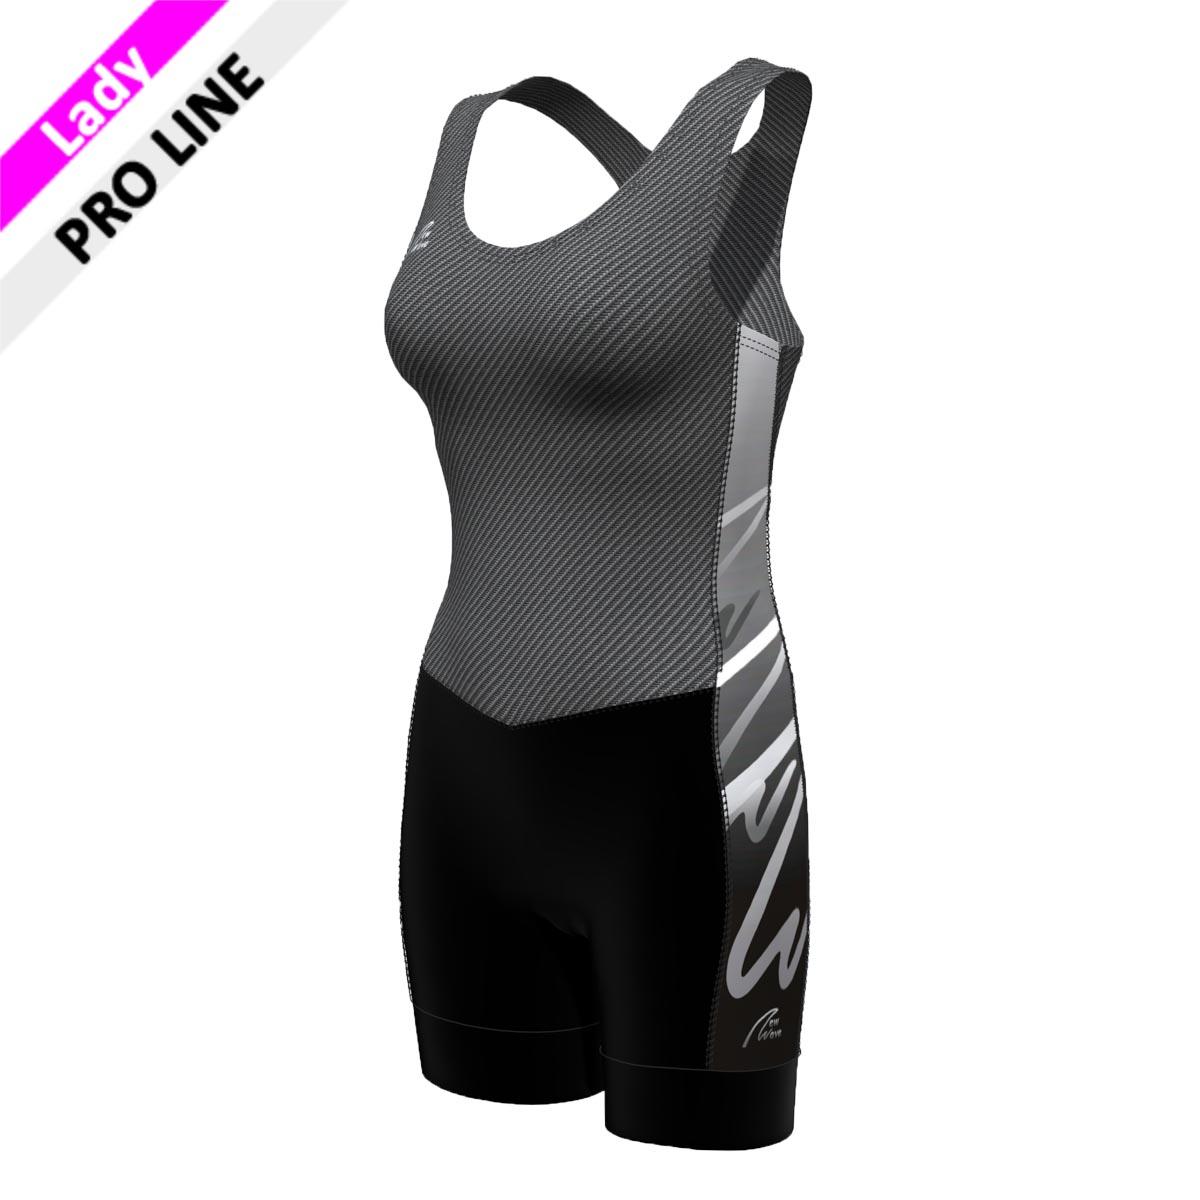 Pro Suit - Lady carbon/grau (Body - carbon/ Hose - schwarz/ Seitenstreifen - NW grau verlaufend)